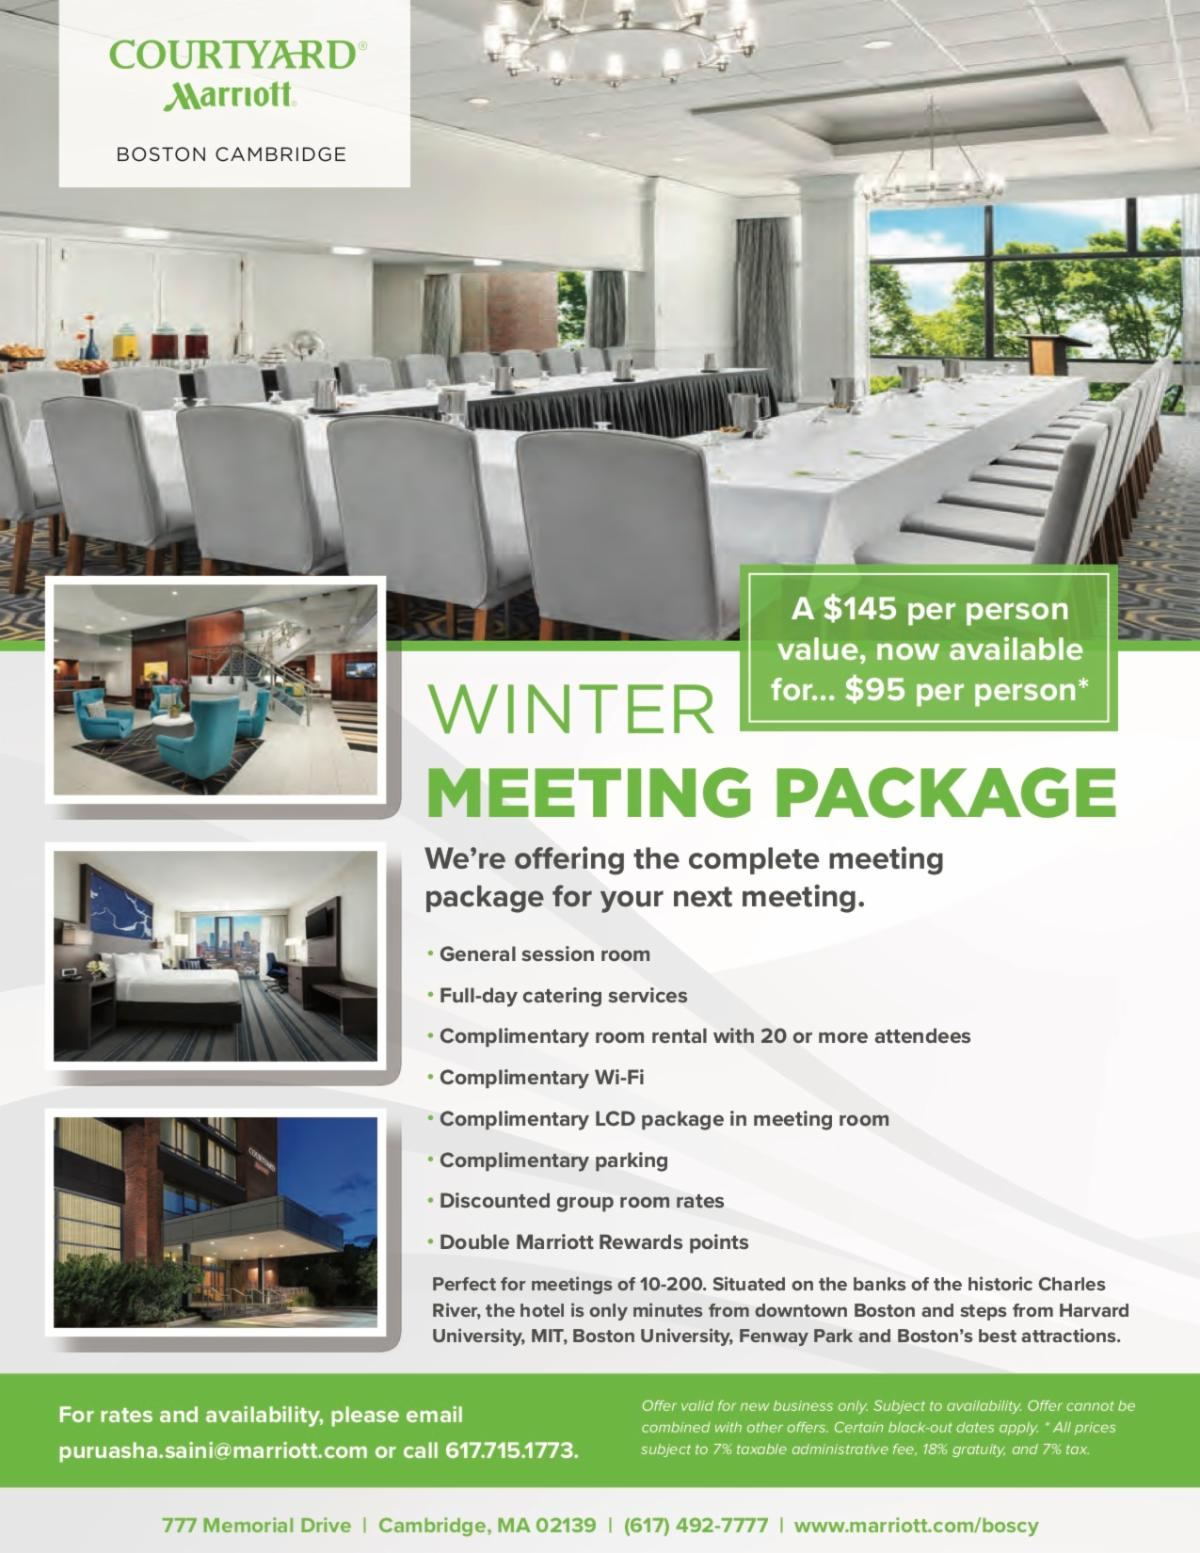 Link to pdf flyer of Winter 2019 Courtyard Marriott meeting package